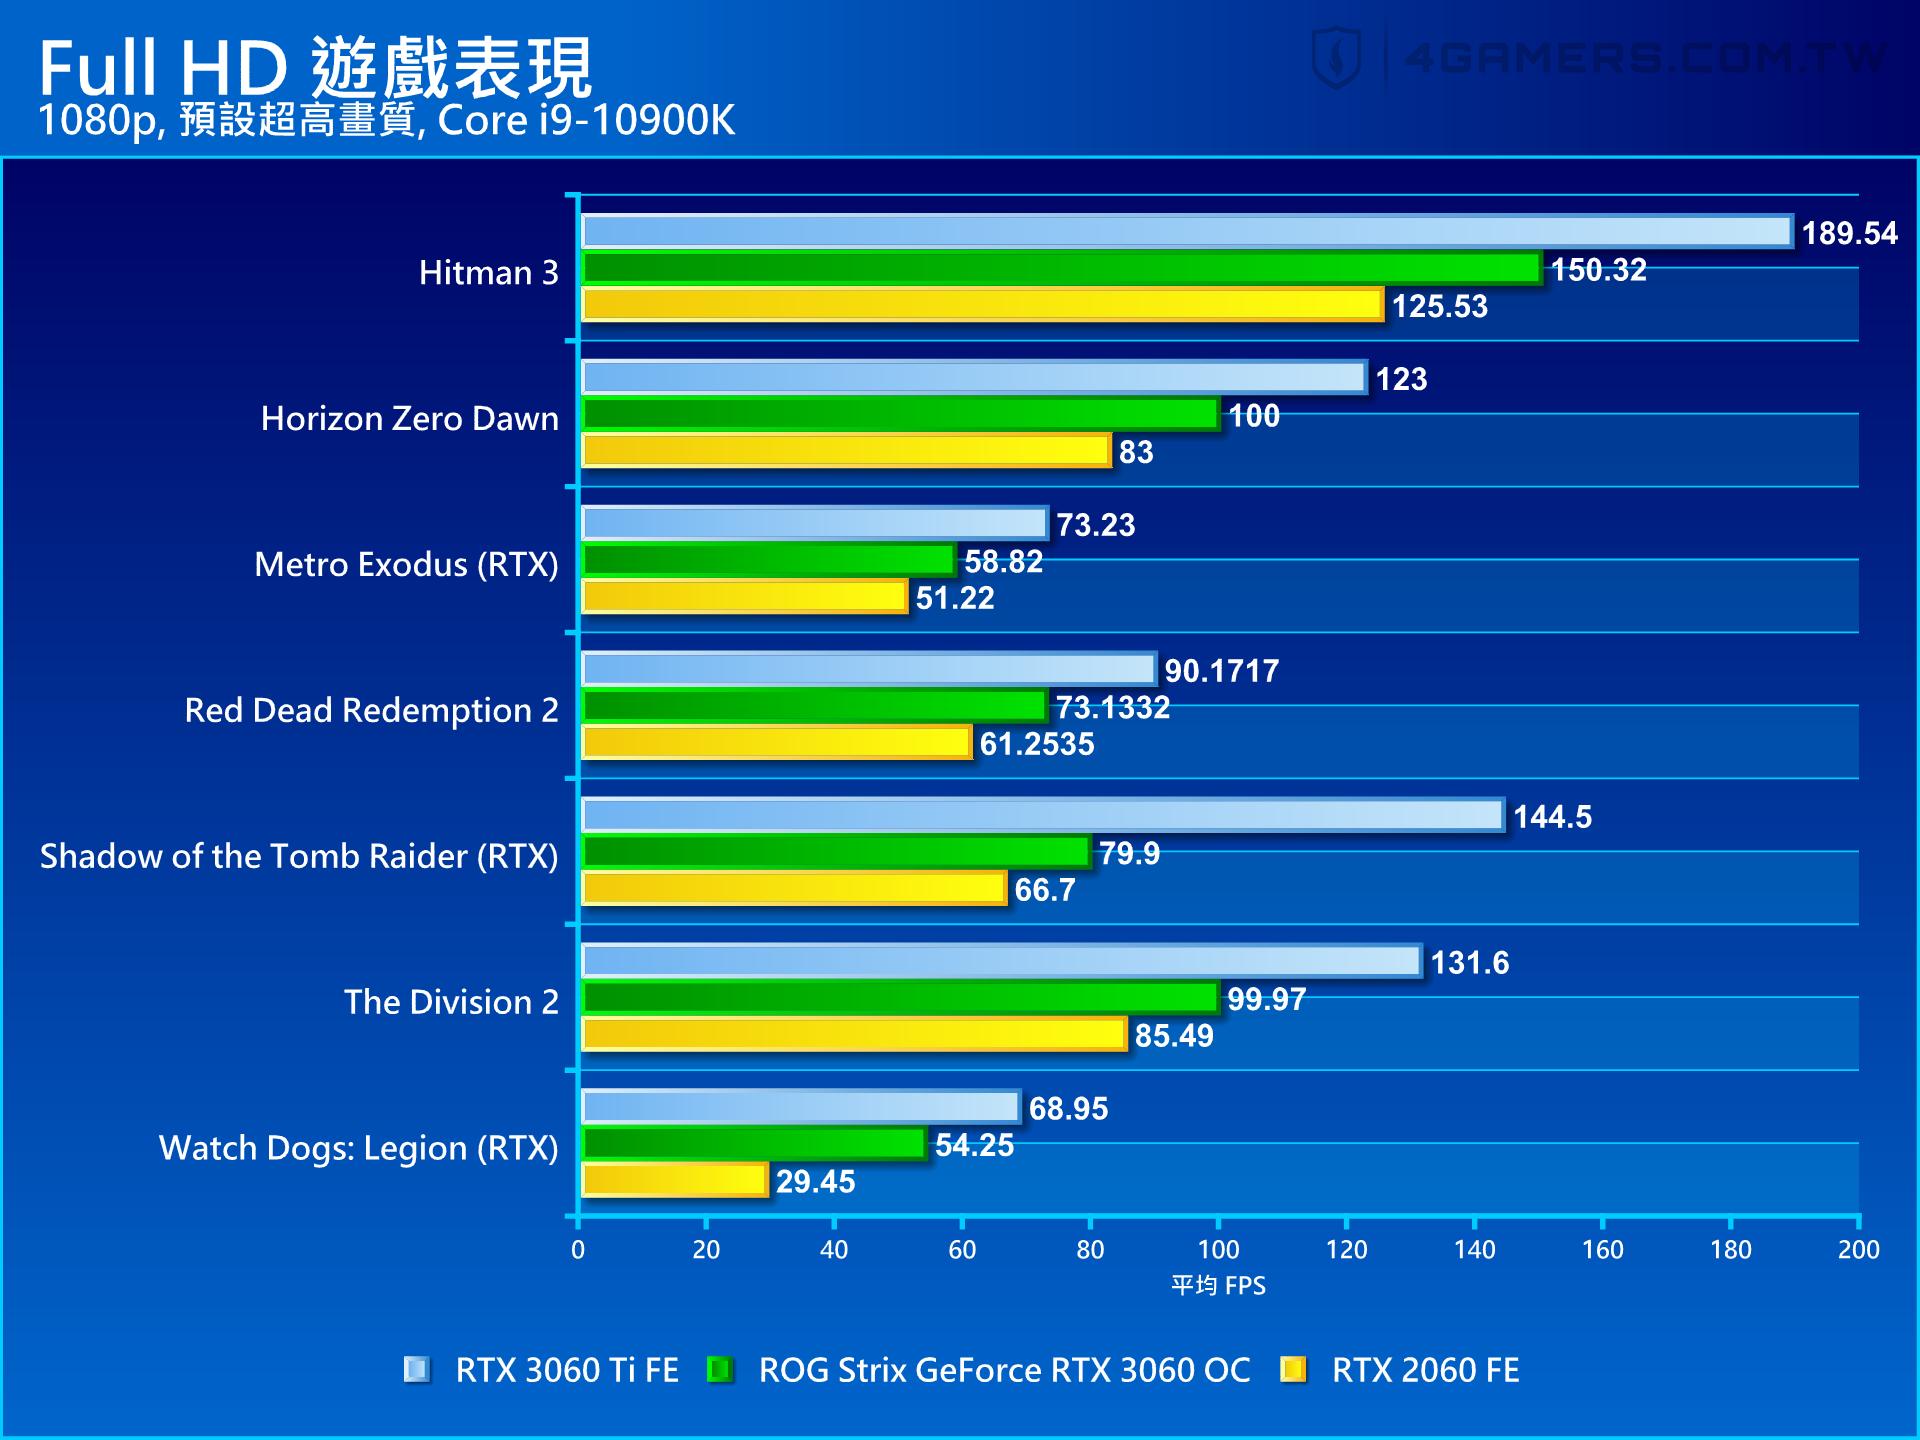 ASUS ROG StrixGeForce RTX 3060 O8G